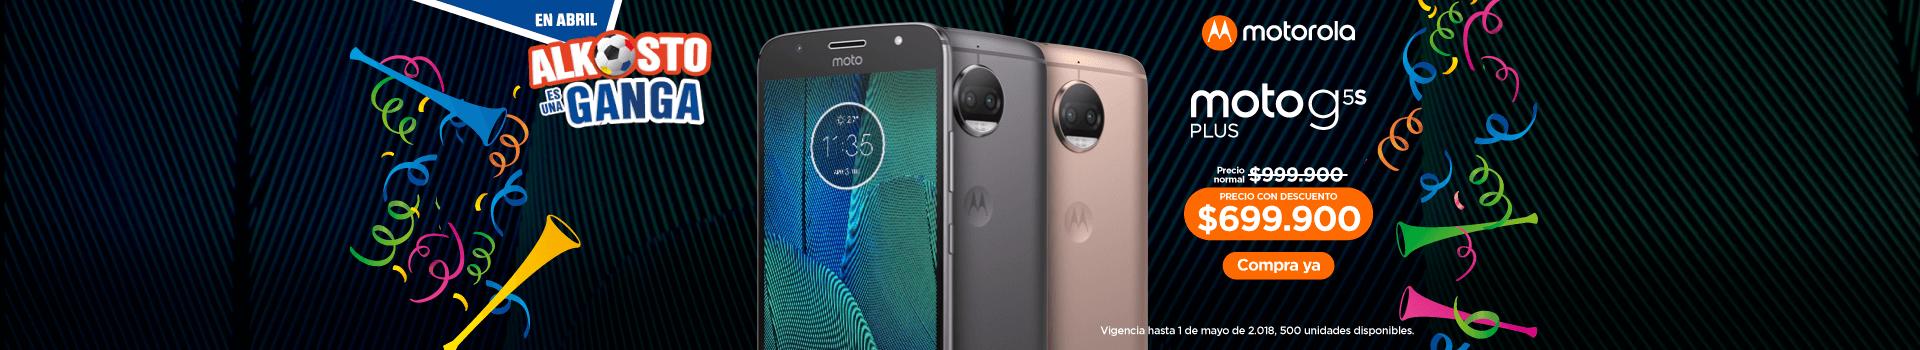 AK-BCAT-1-celulares-PP-EXPM-Motorola-MotoG5sPlus-Abr24